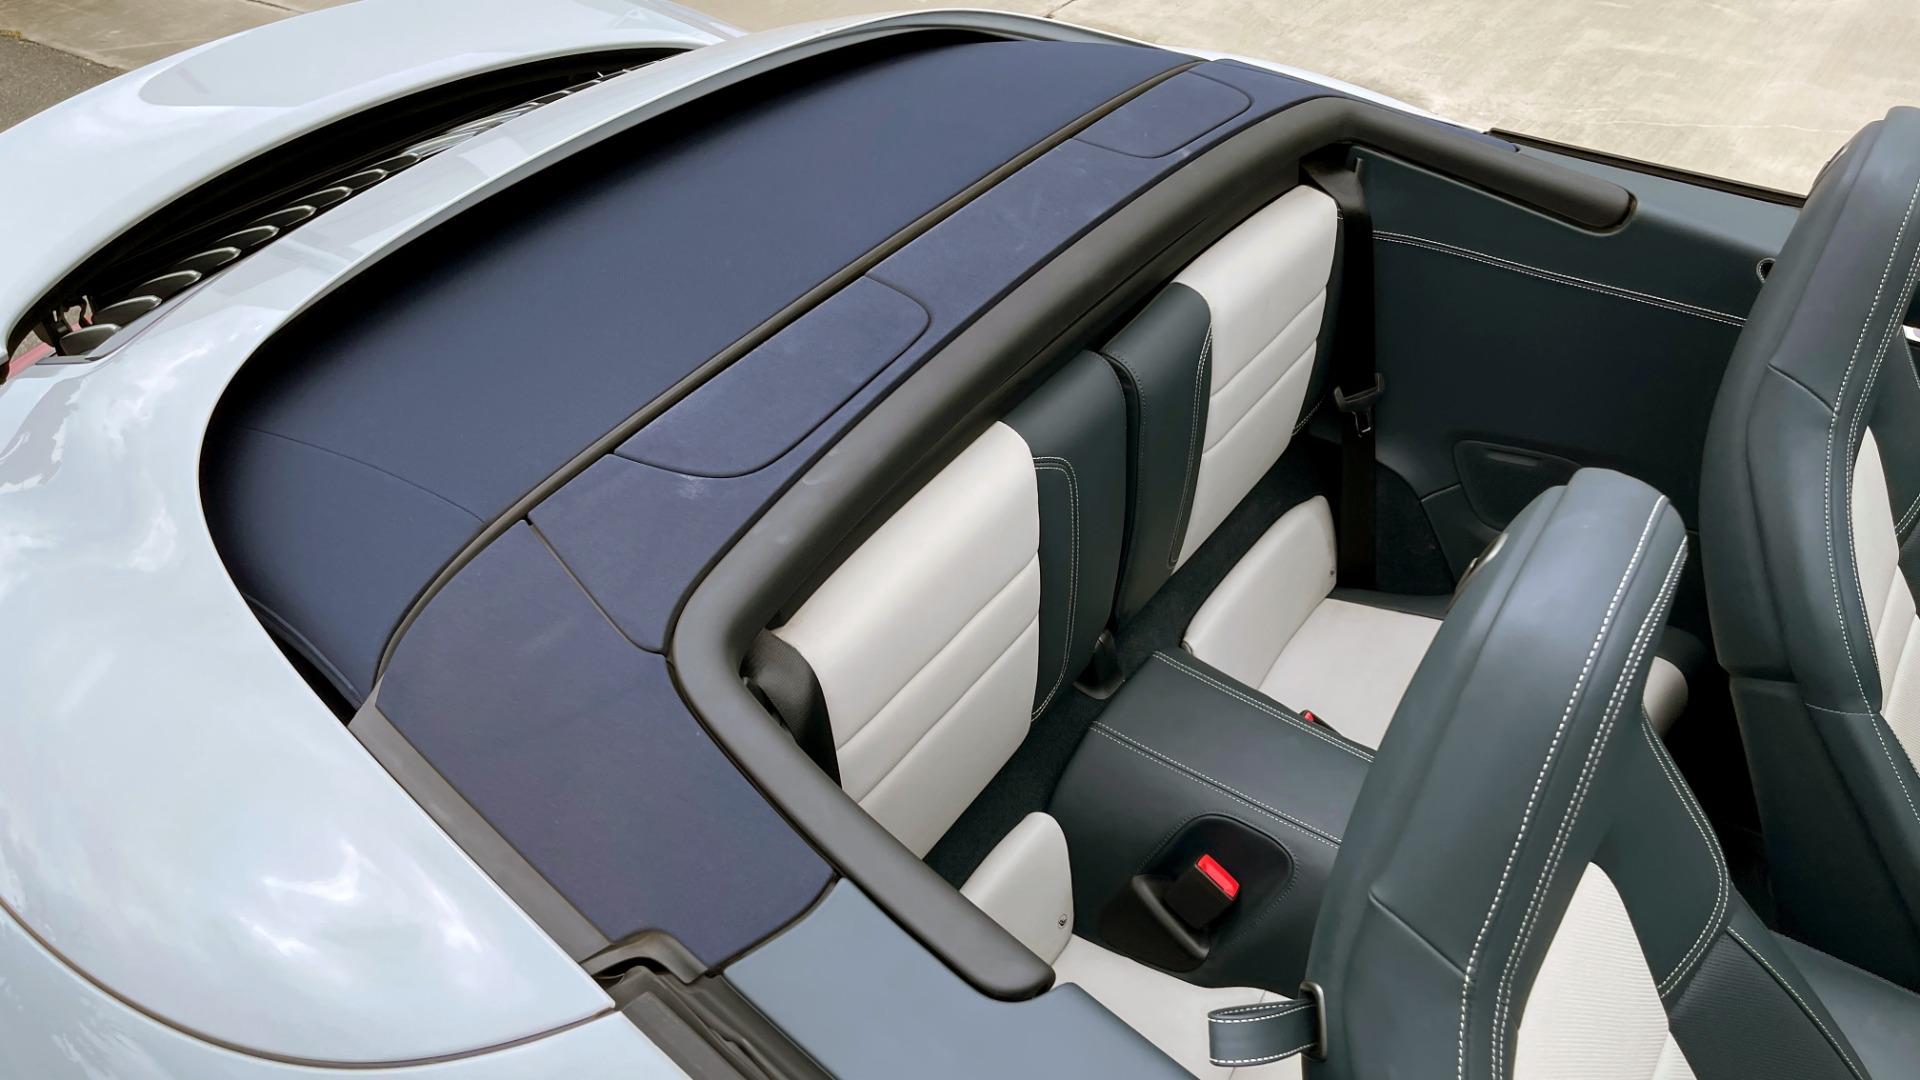 Used 2020 Porsche 911 CARRERA 4S CABRIOLET PREMIUM SPORT PKG / NAV / BOSE / LIGHT DESIGN PKG for sale $167,595 at Formula Imports in Charlotte NC 28227 77